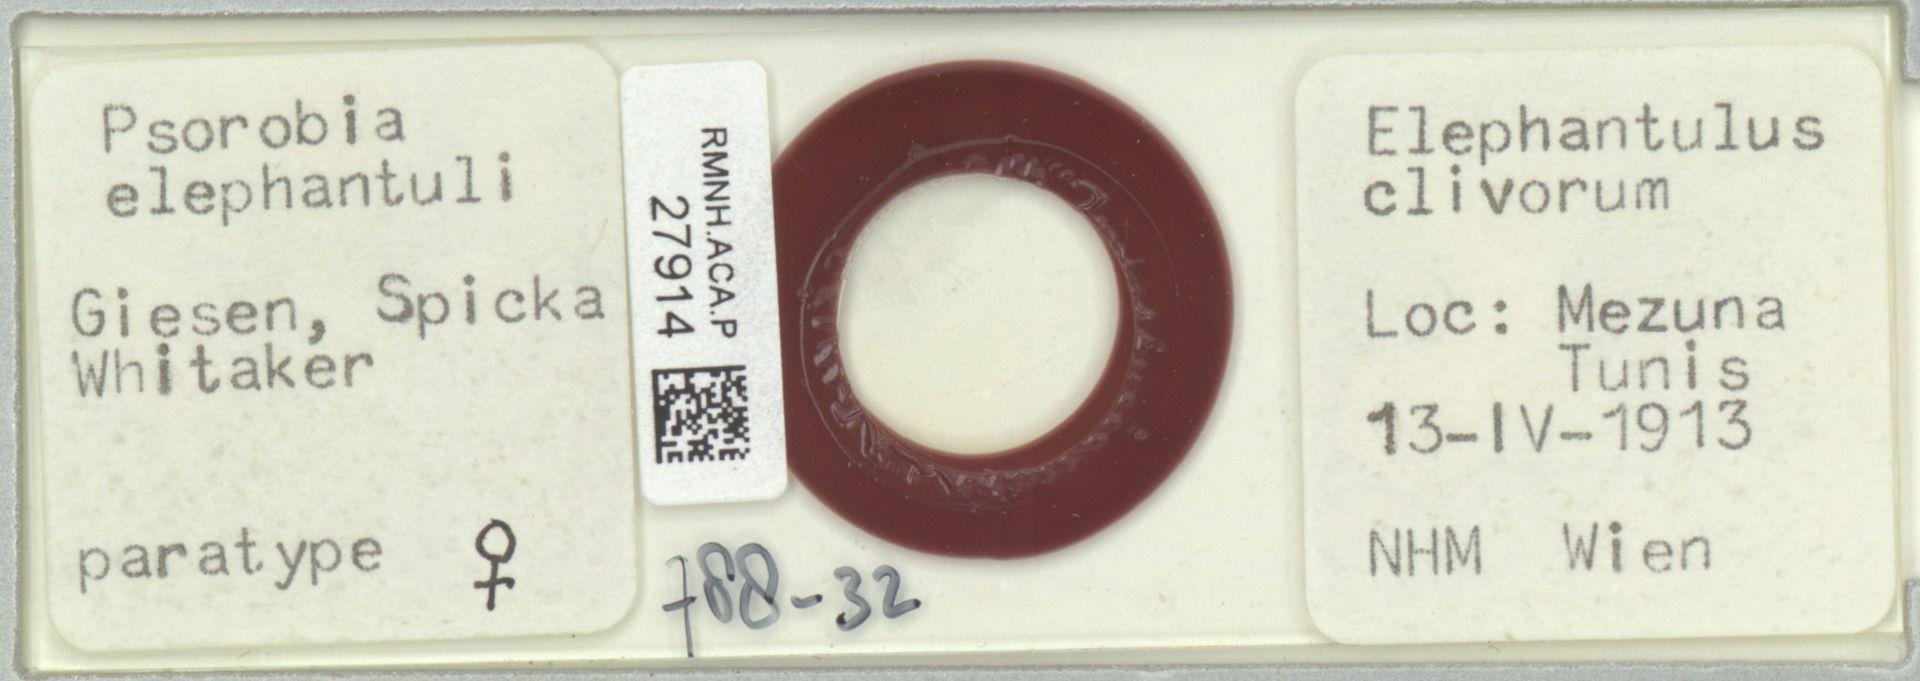 RMNH.ACA.P.27914   Psorobia elephantuli Giesen, Spicka & Whitaker